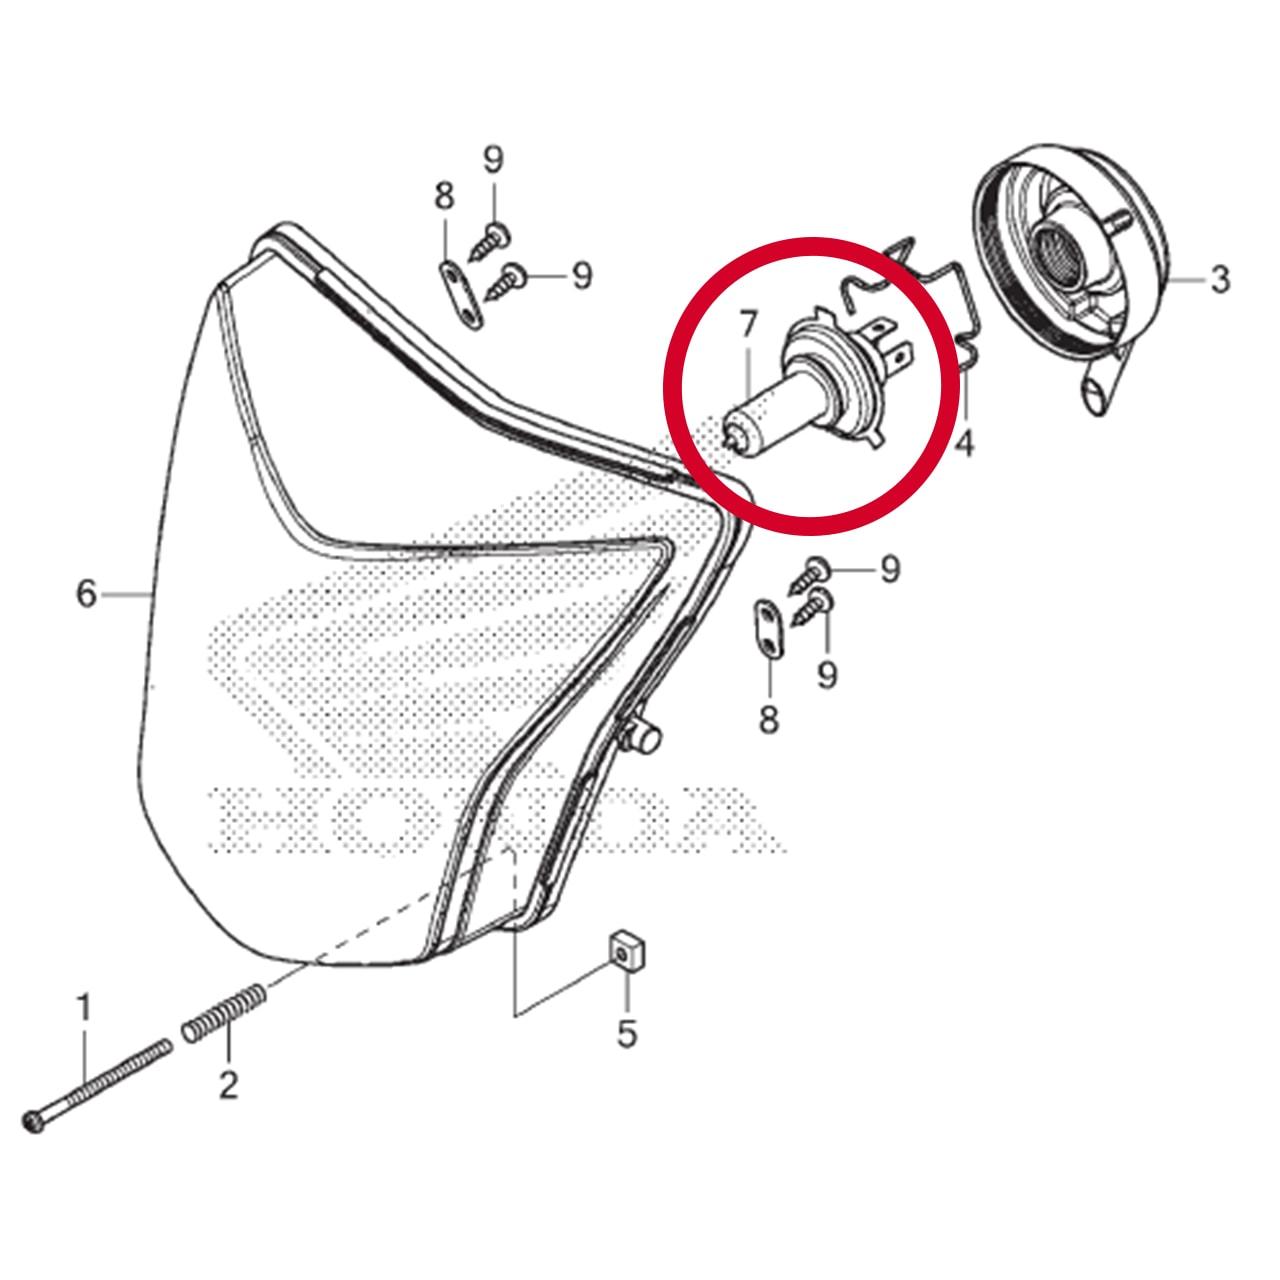 Lampada Farol  BIZ 125 BROS CG FAN TITAN XRE POP 110i Original Honda 34901KTE740